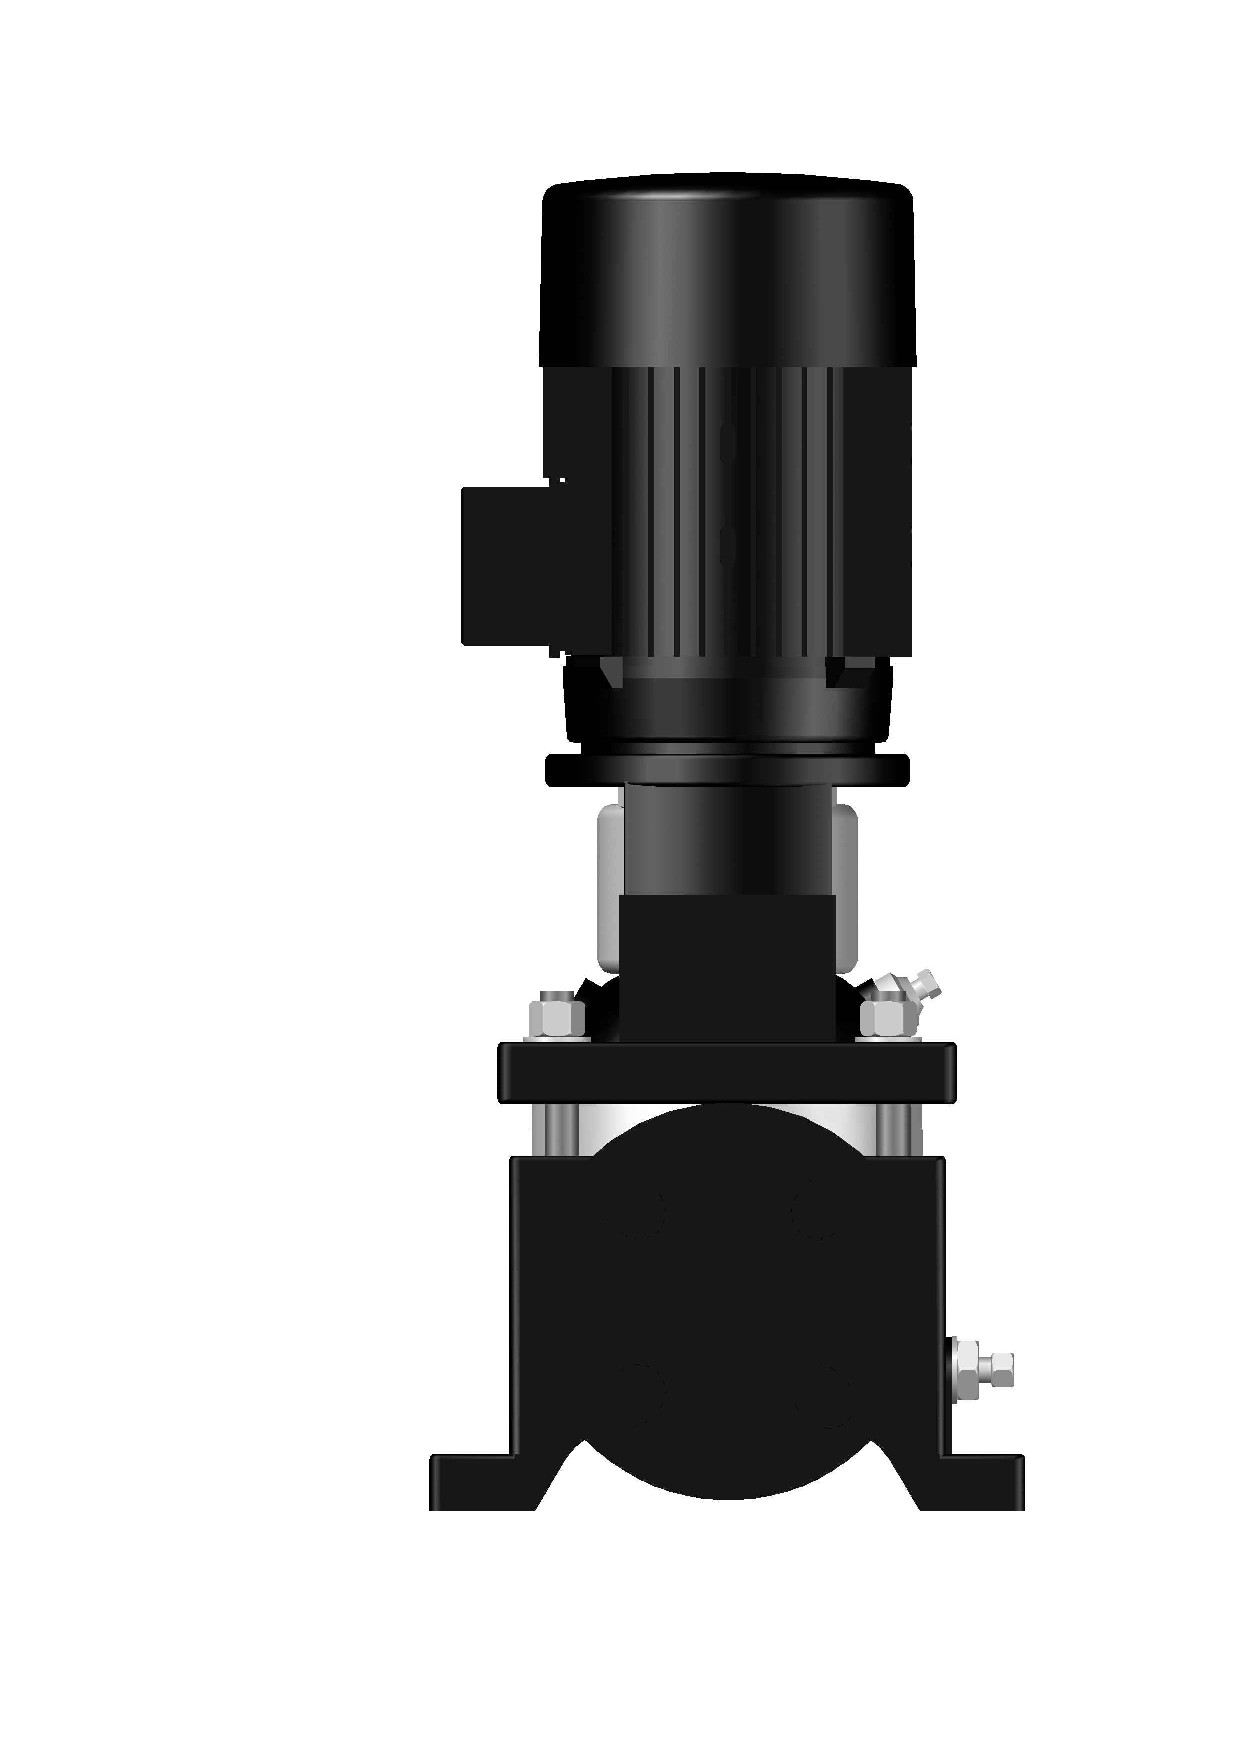 BV 05-02